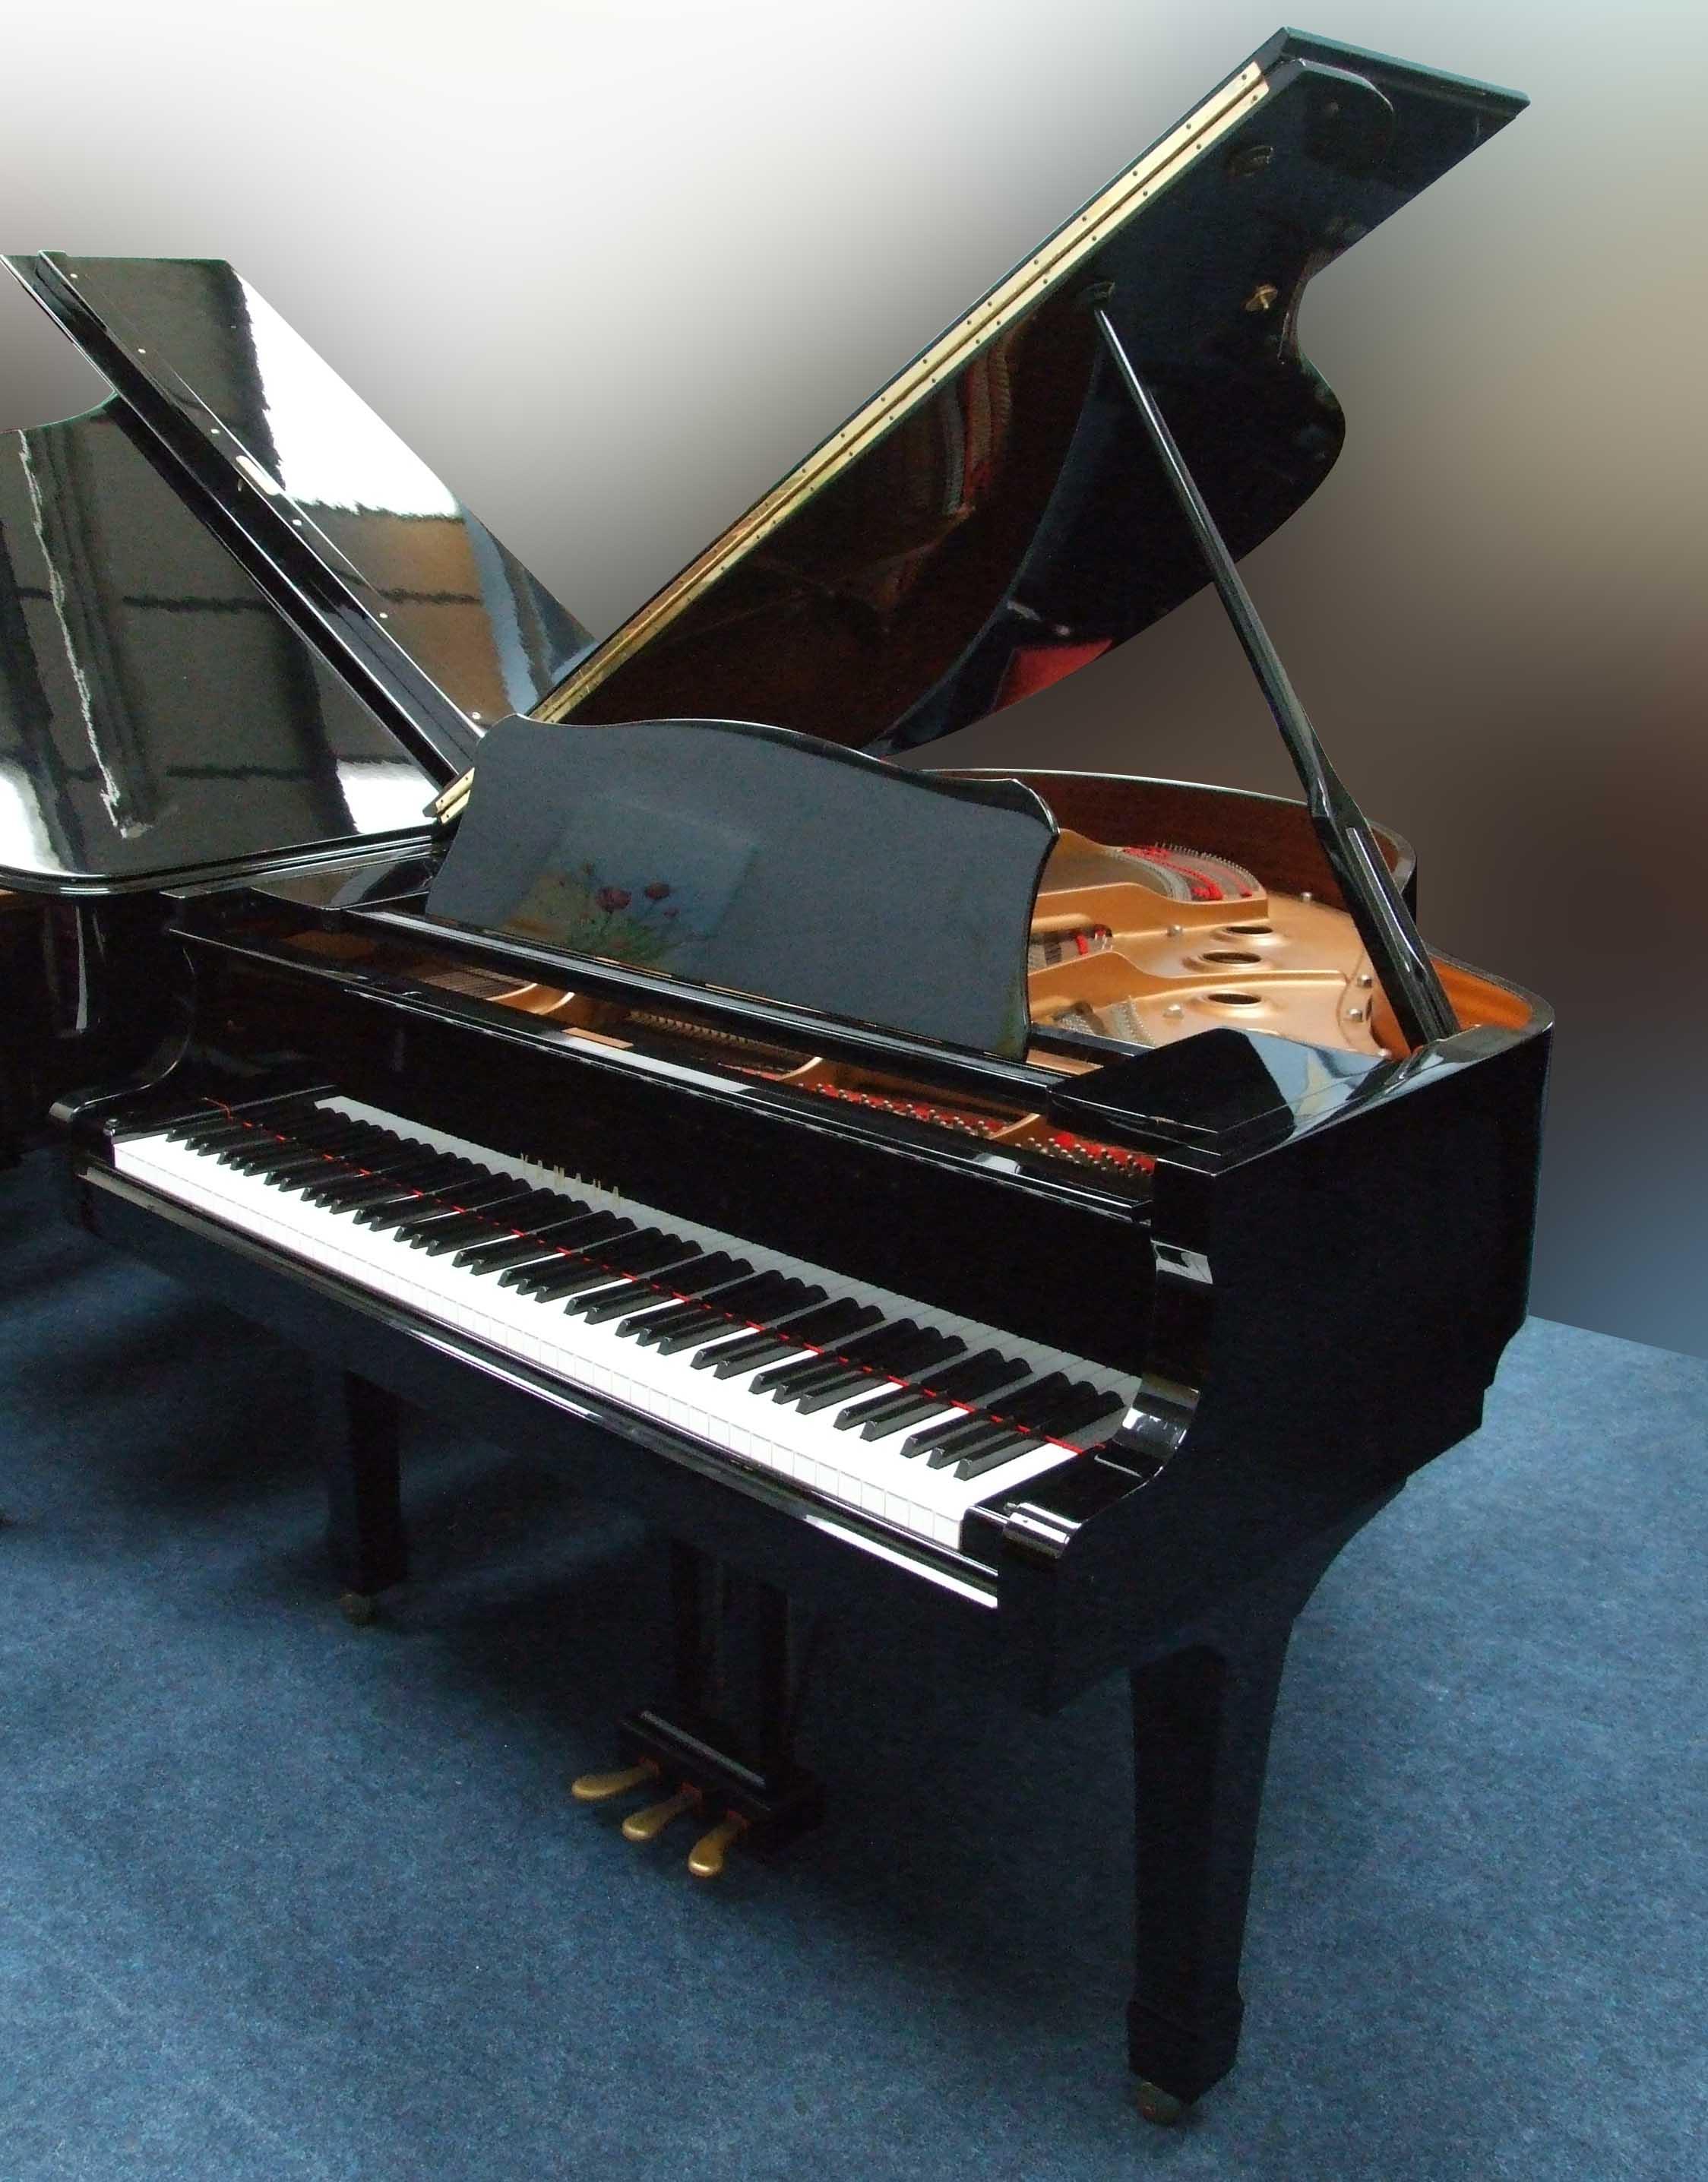 Yamaga C1 grand piano